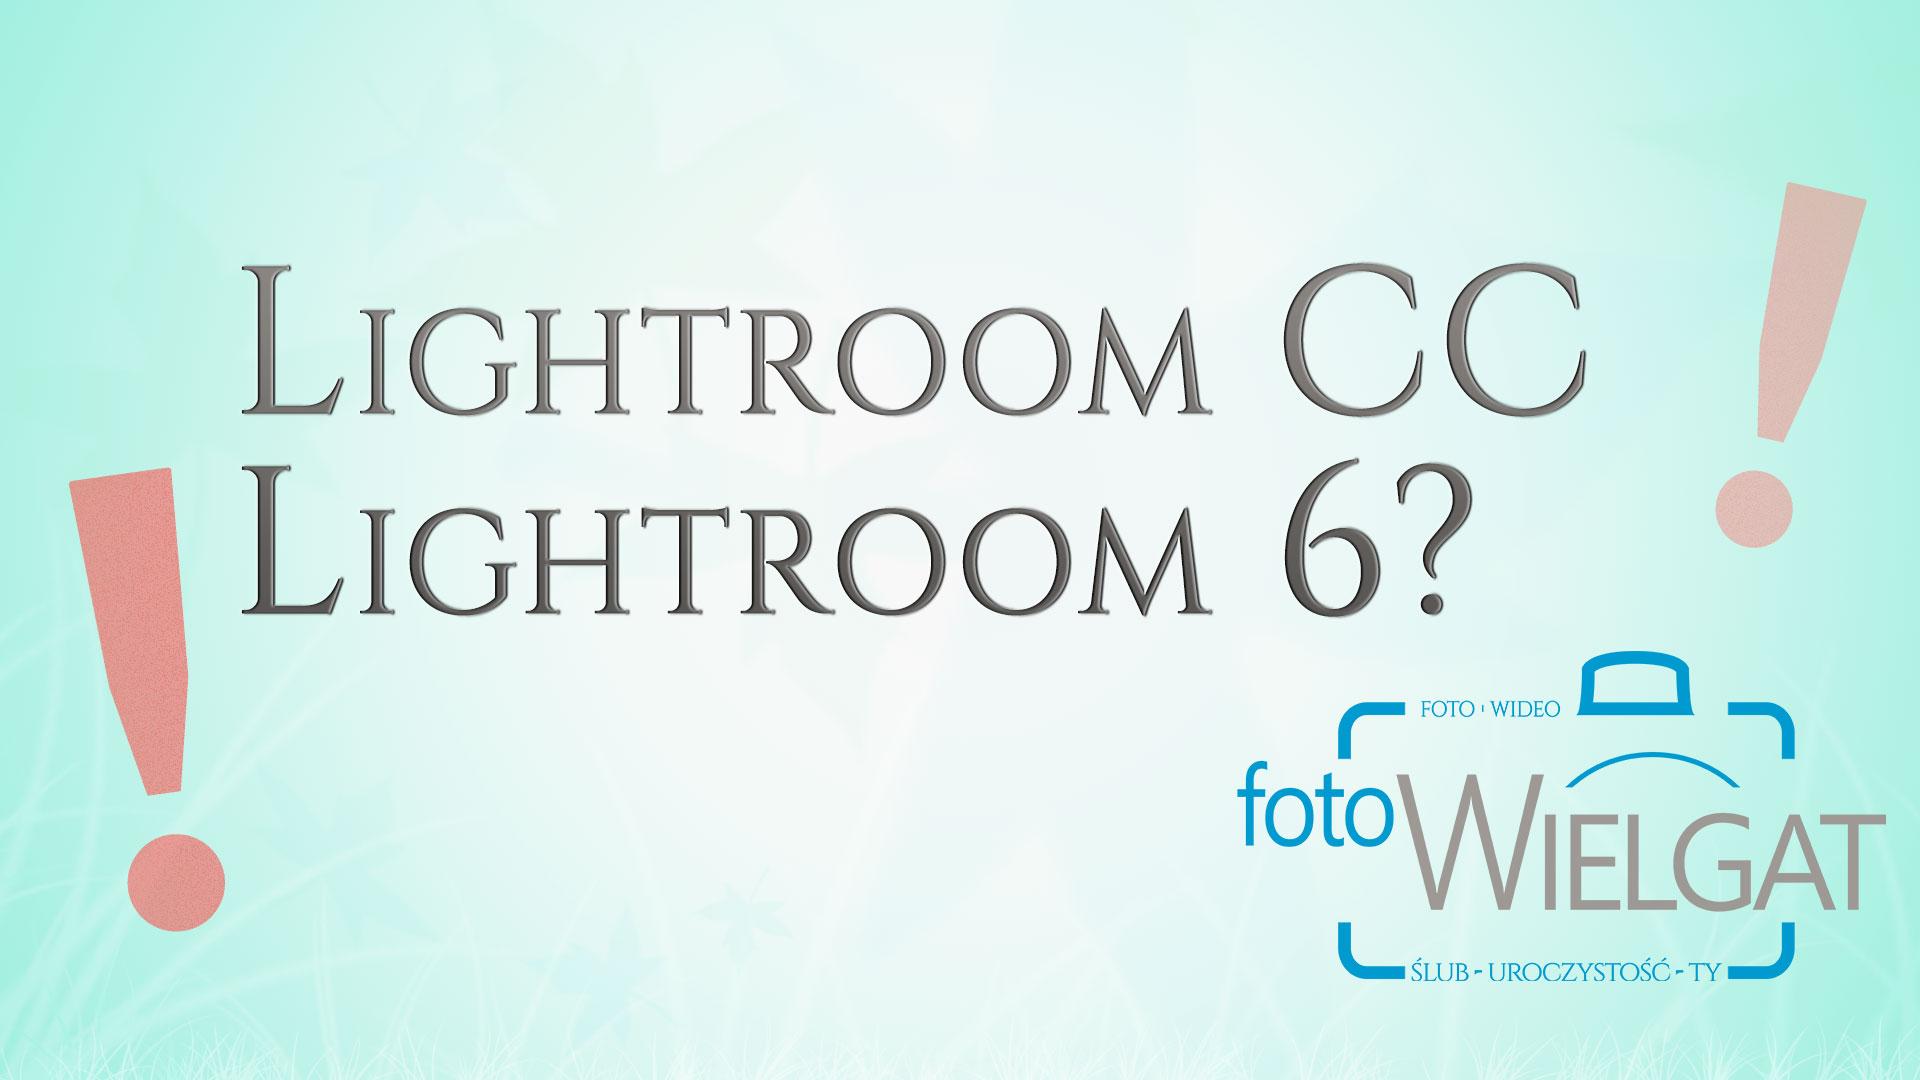 Lightroom 6 CC